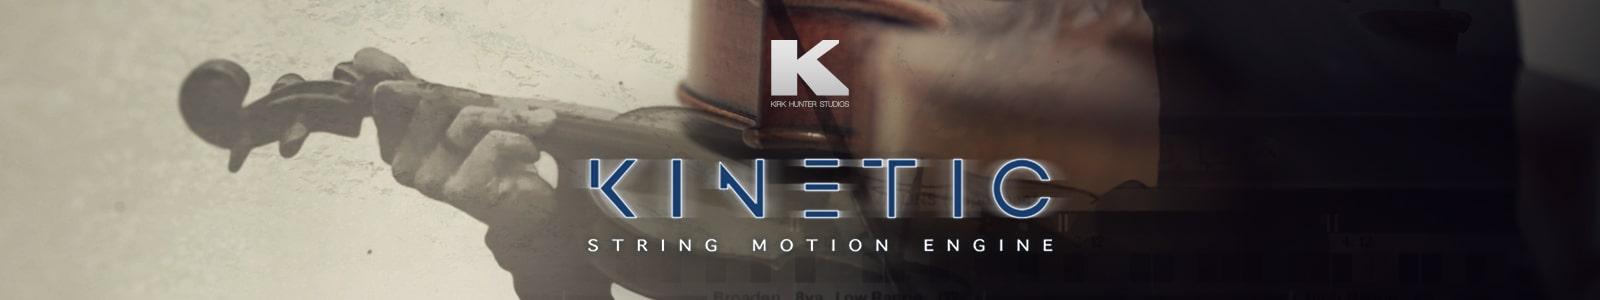 kinetic string motion engine